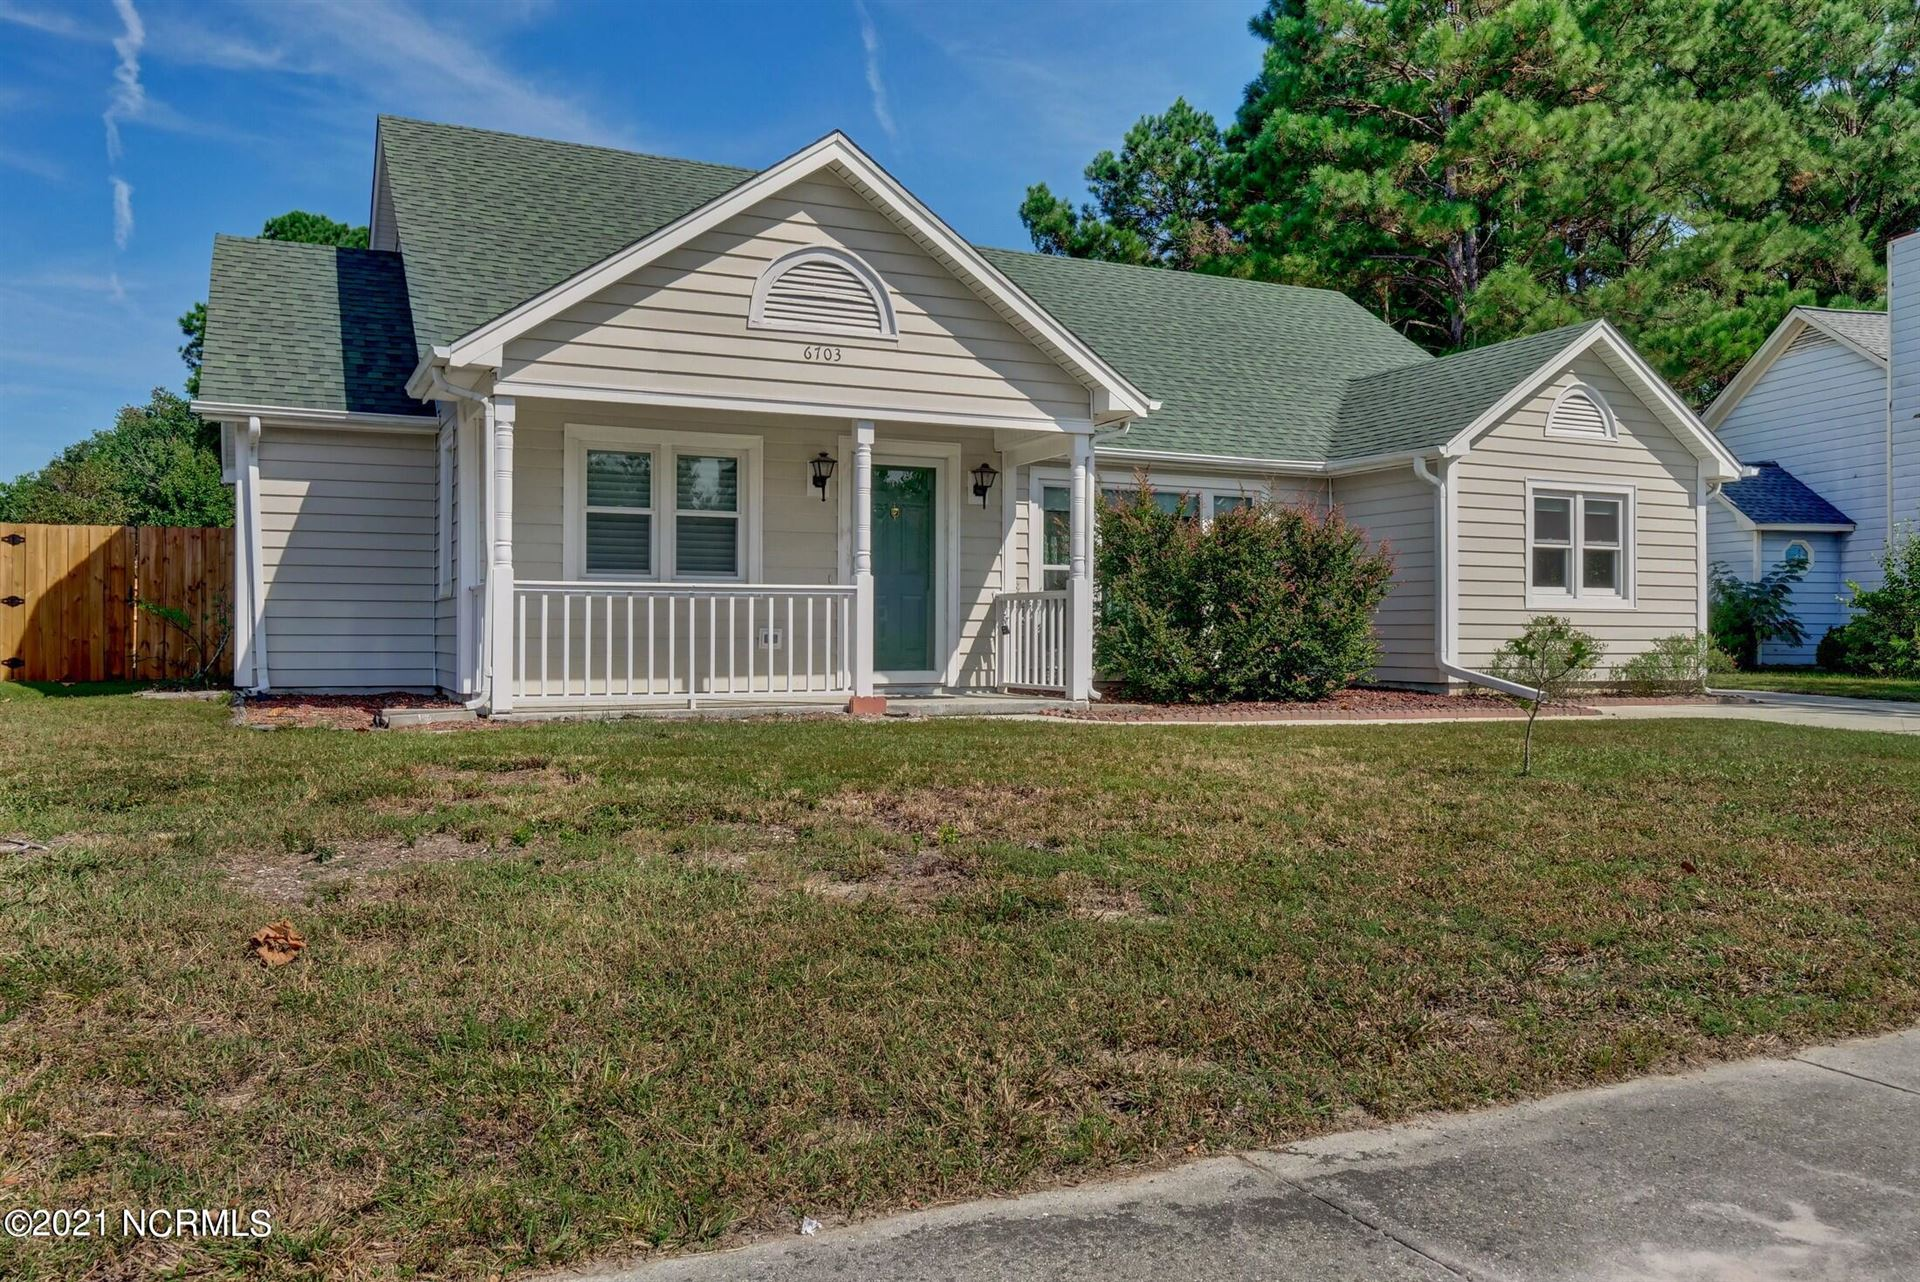 Photo of 6703 Low Bush Court, Wilmington, NC 28405 (MLS # 100293457)